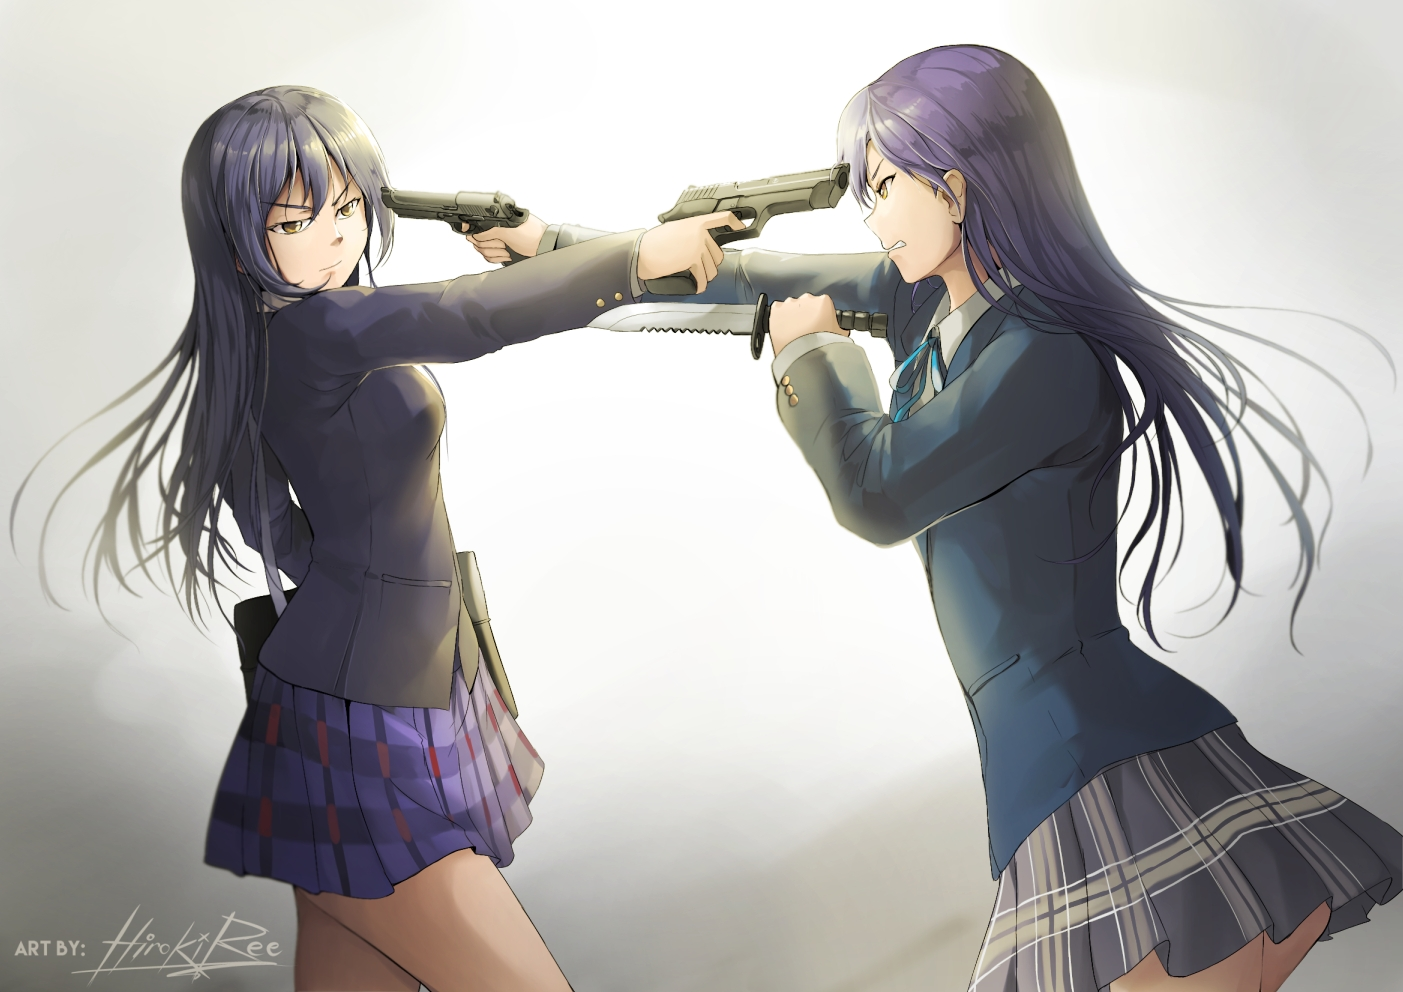 2girls blue_hair crossover gradient gun hiroki_ree idolmaster kisaragi_chihaya knife long_hair love_live!_school_idol_project school_uniform signed skirt sonoda_umi weapon yellow_eyes